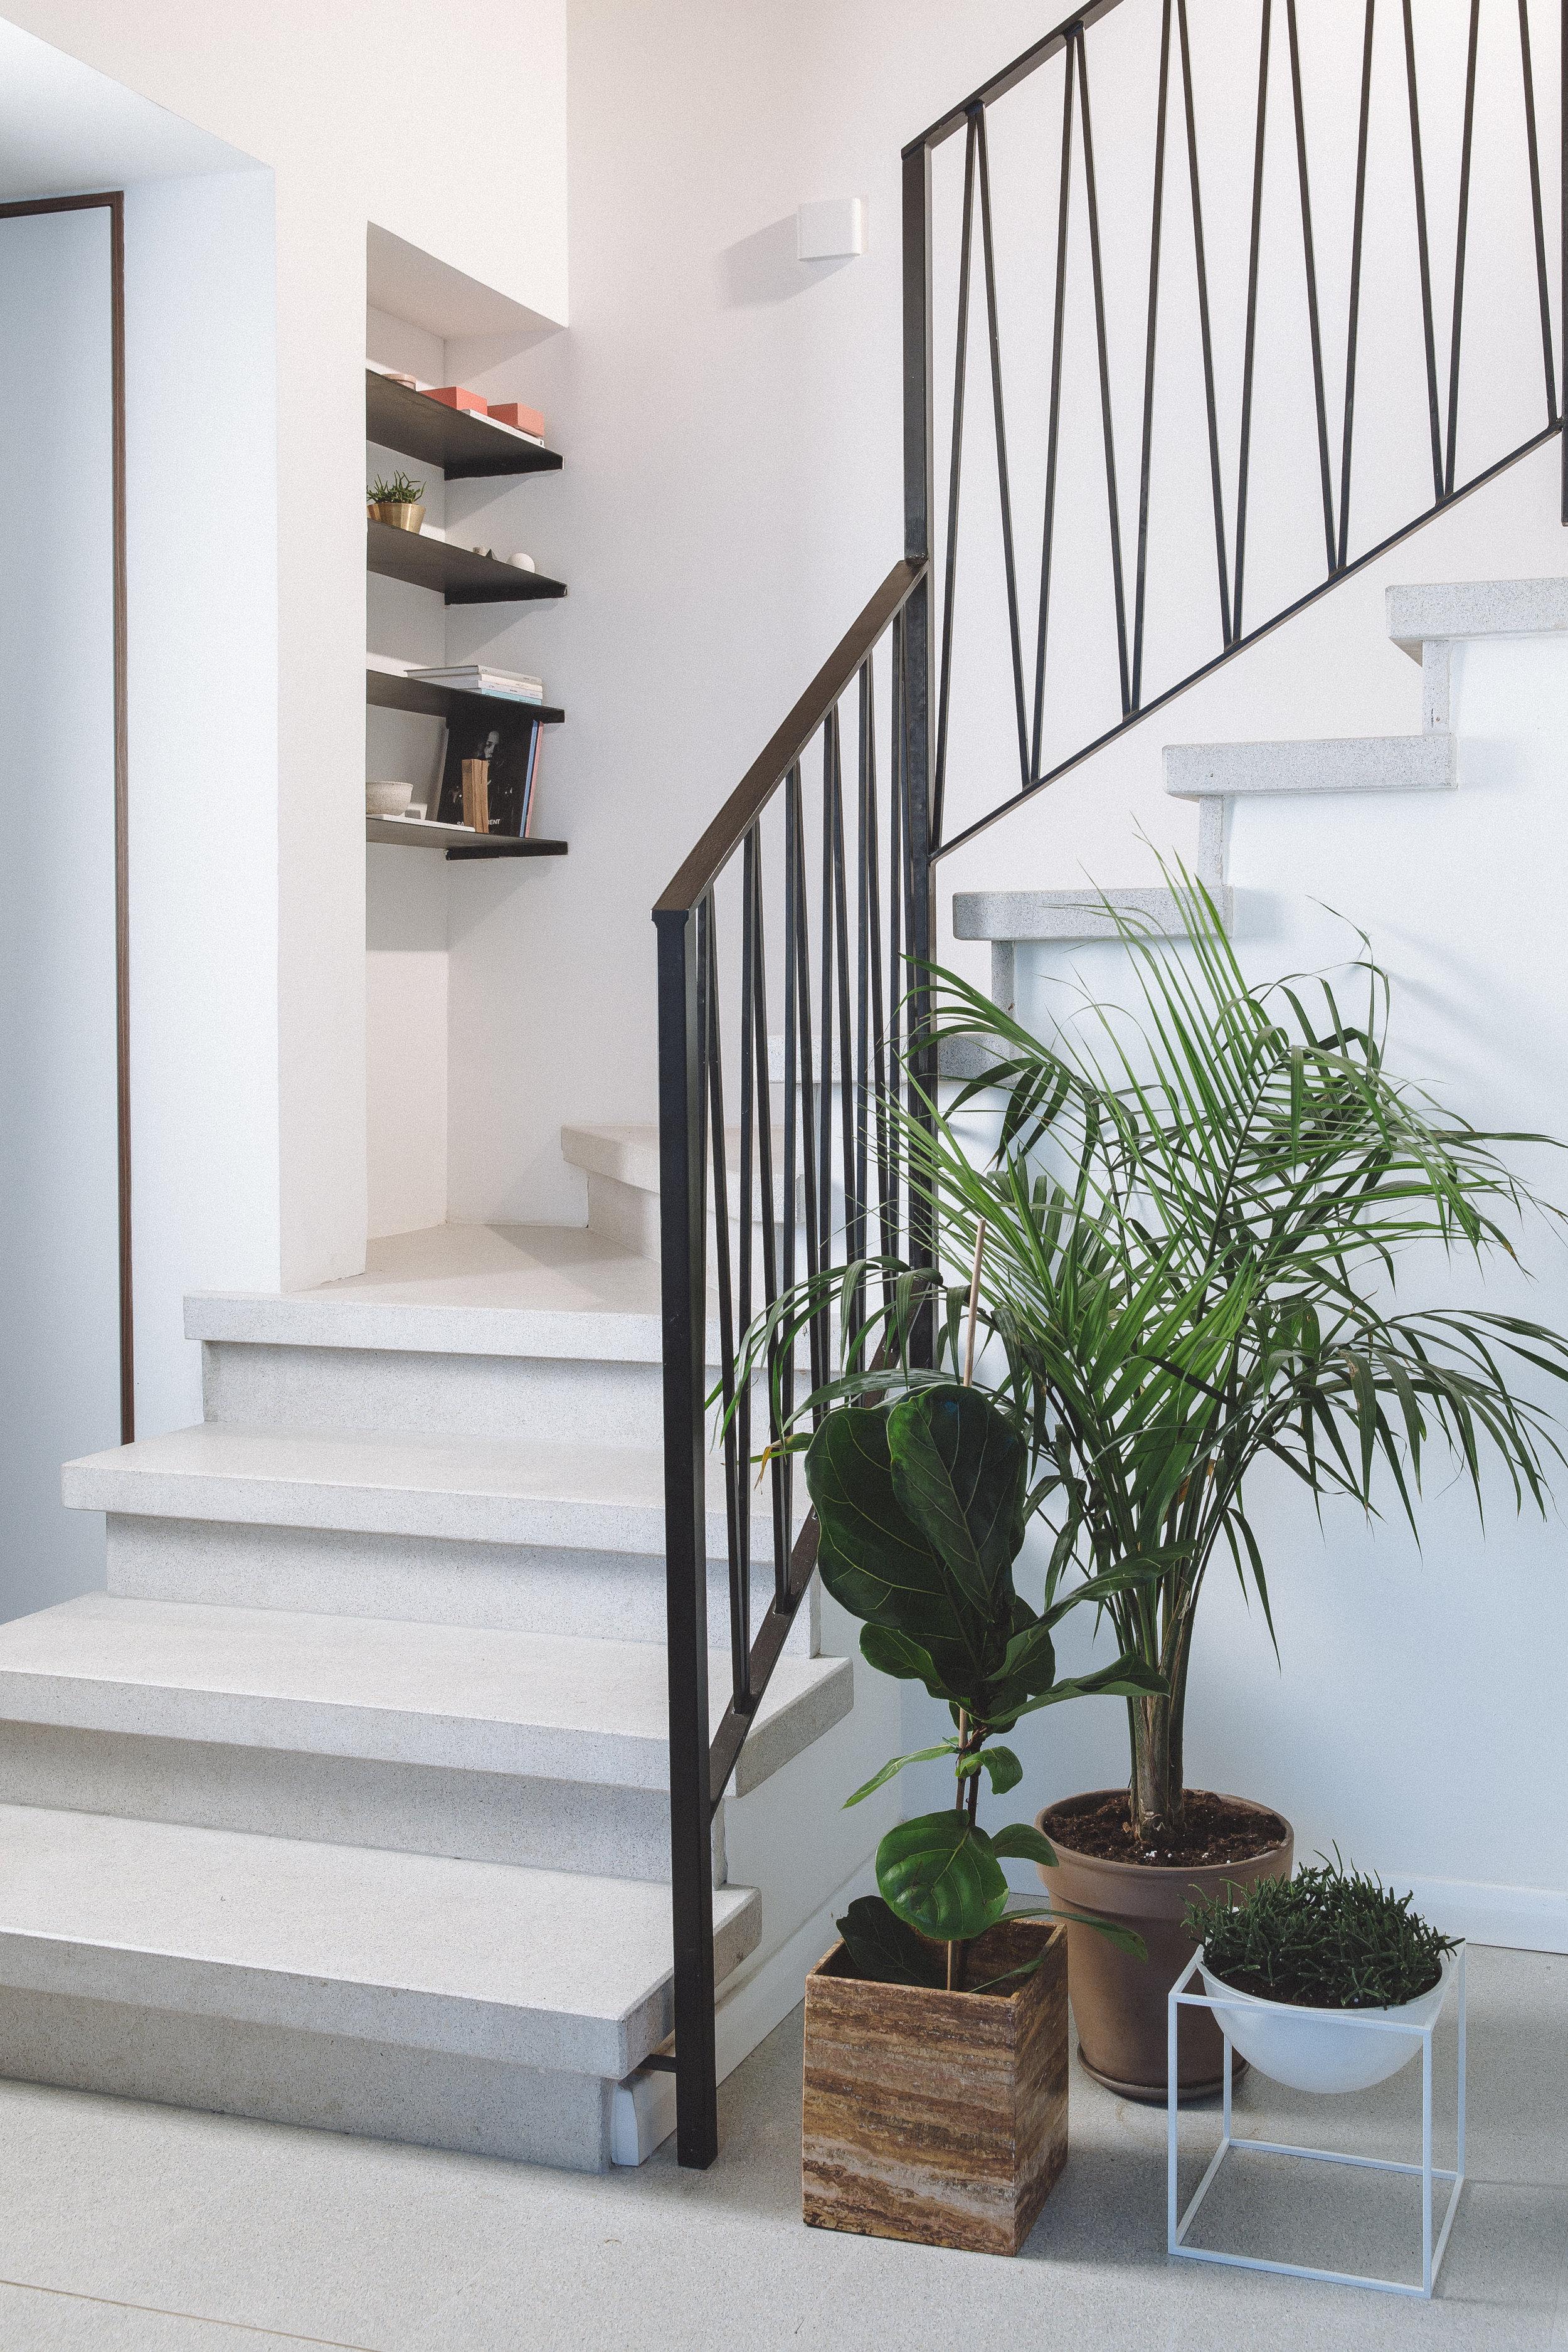 Steel railing. Terrazzo stairs. Greenery in interior design